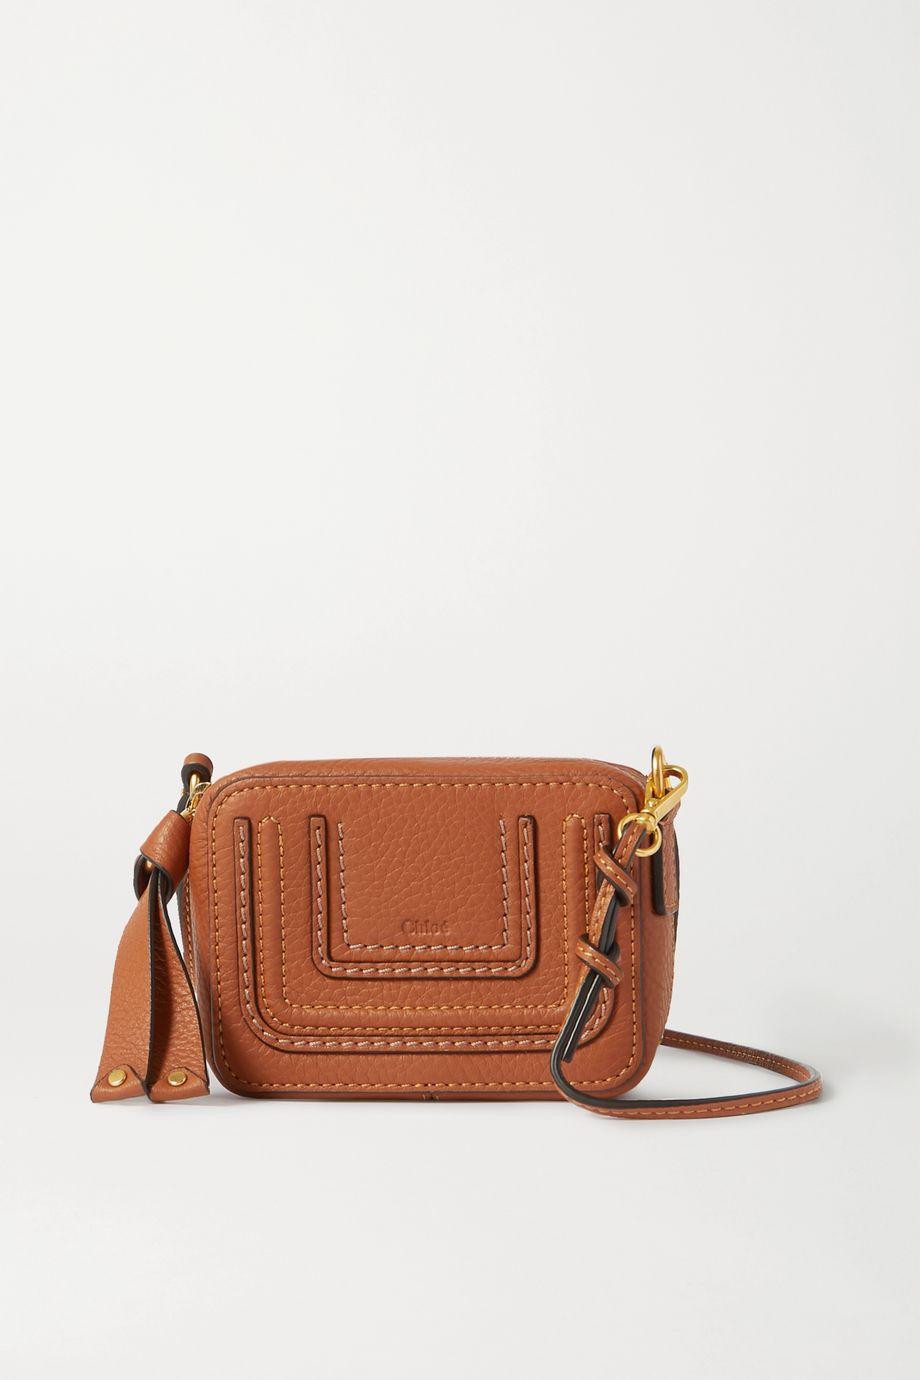 Bags Chloé Net A Porter